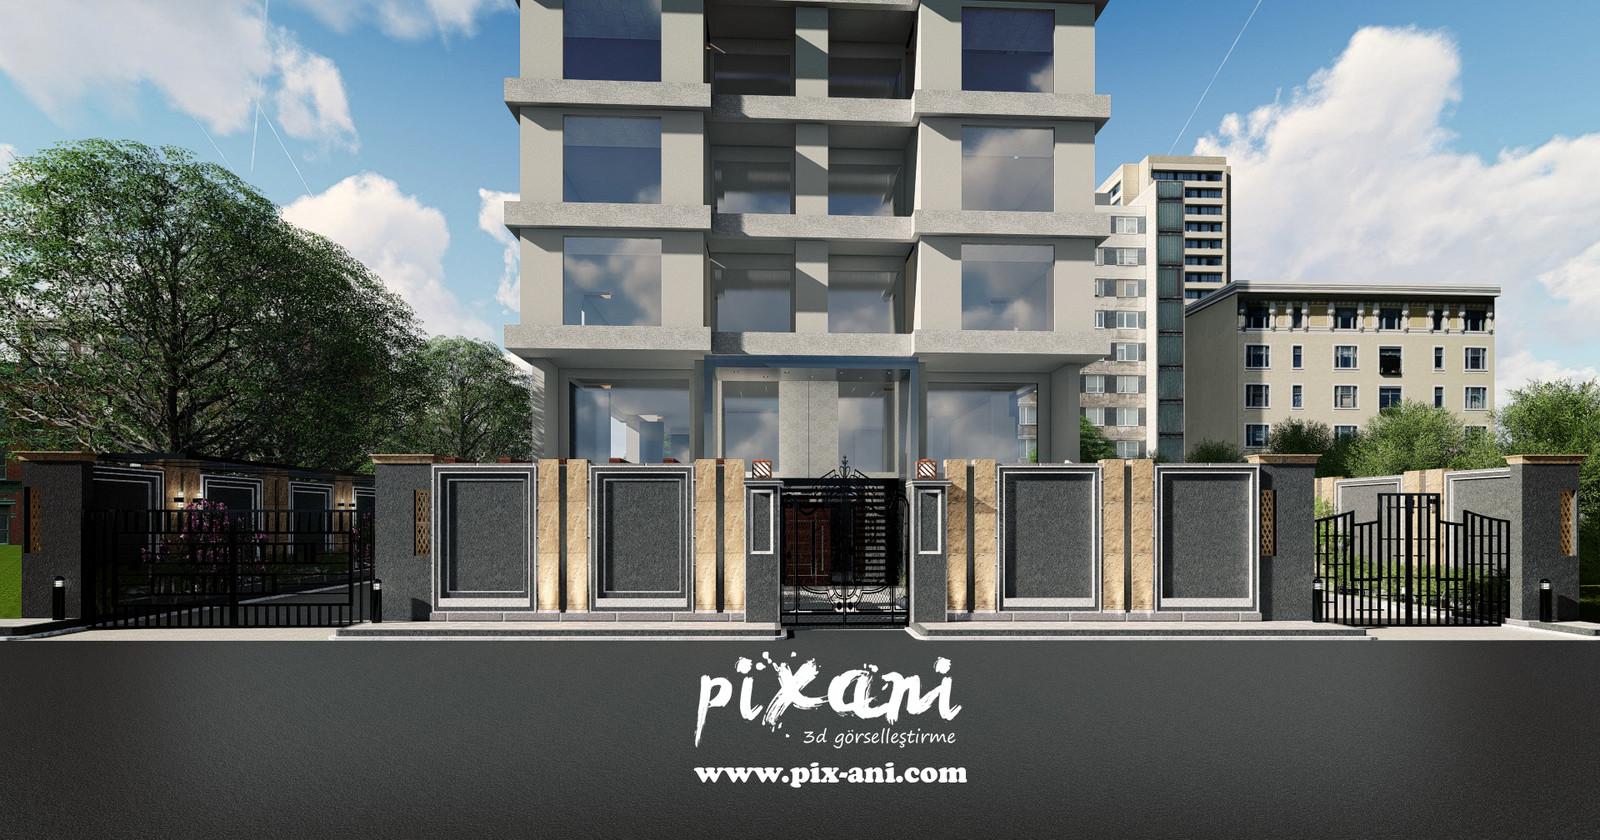 Architect & CG Artist : Serdar Çakmak rendered and designed in Pixani Studios www.pix-ani.com